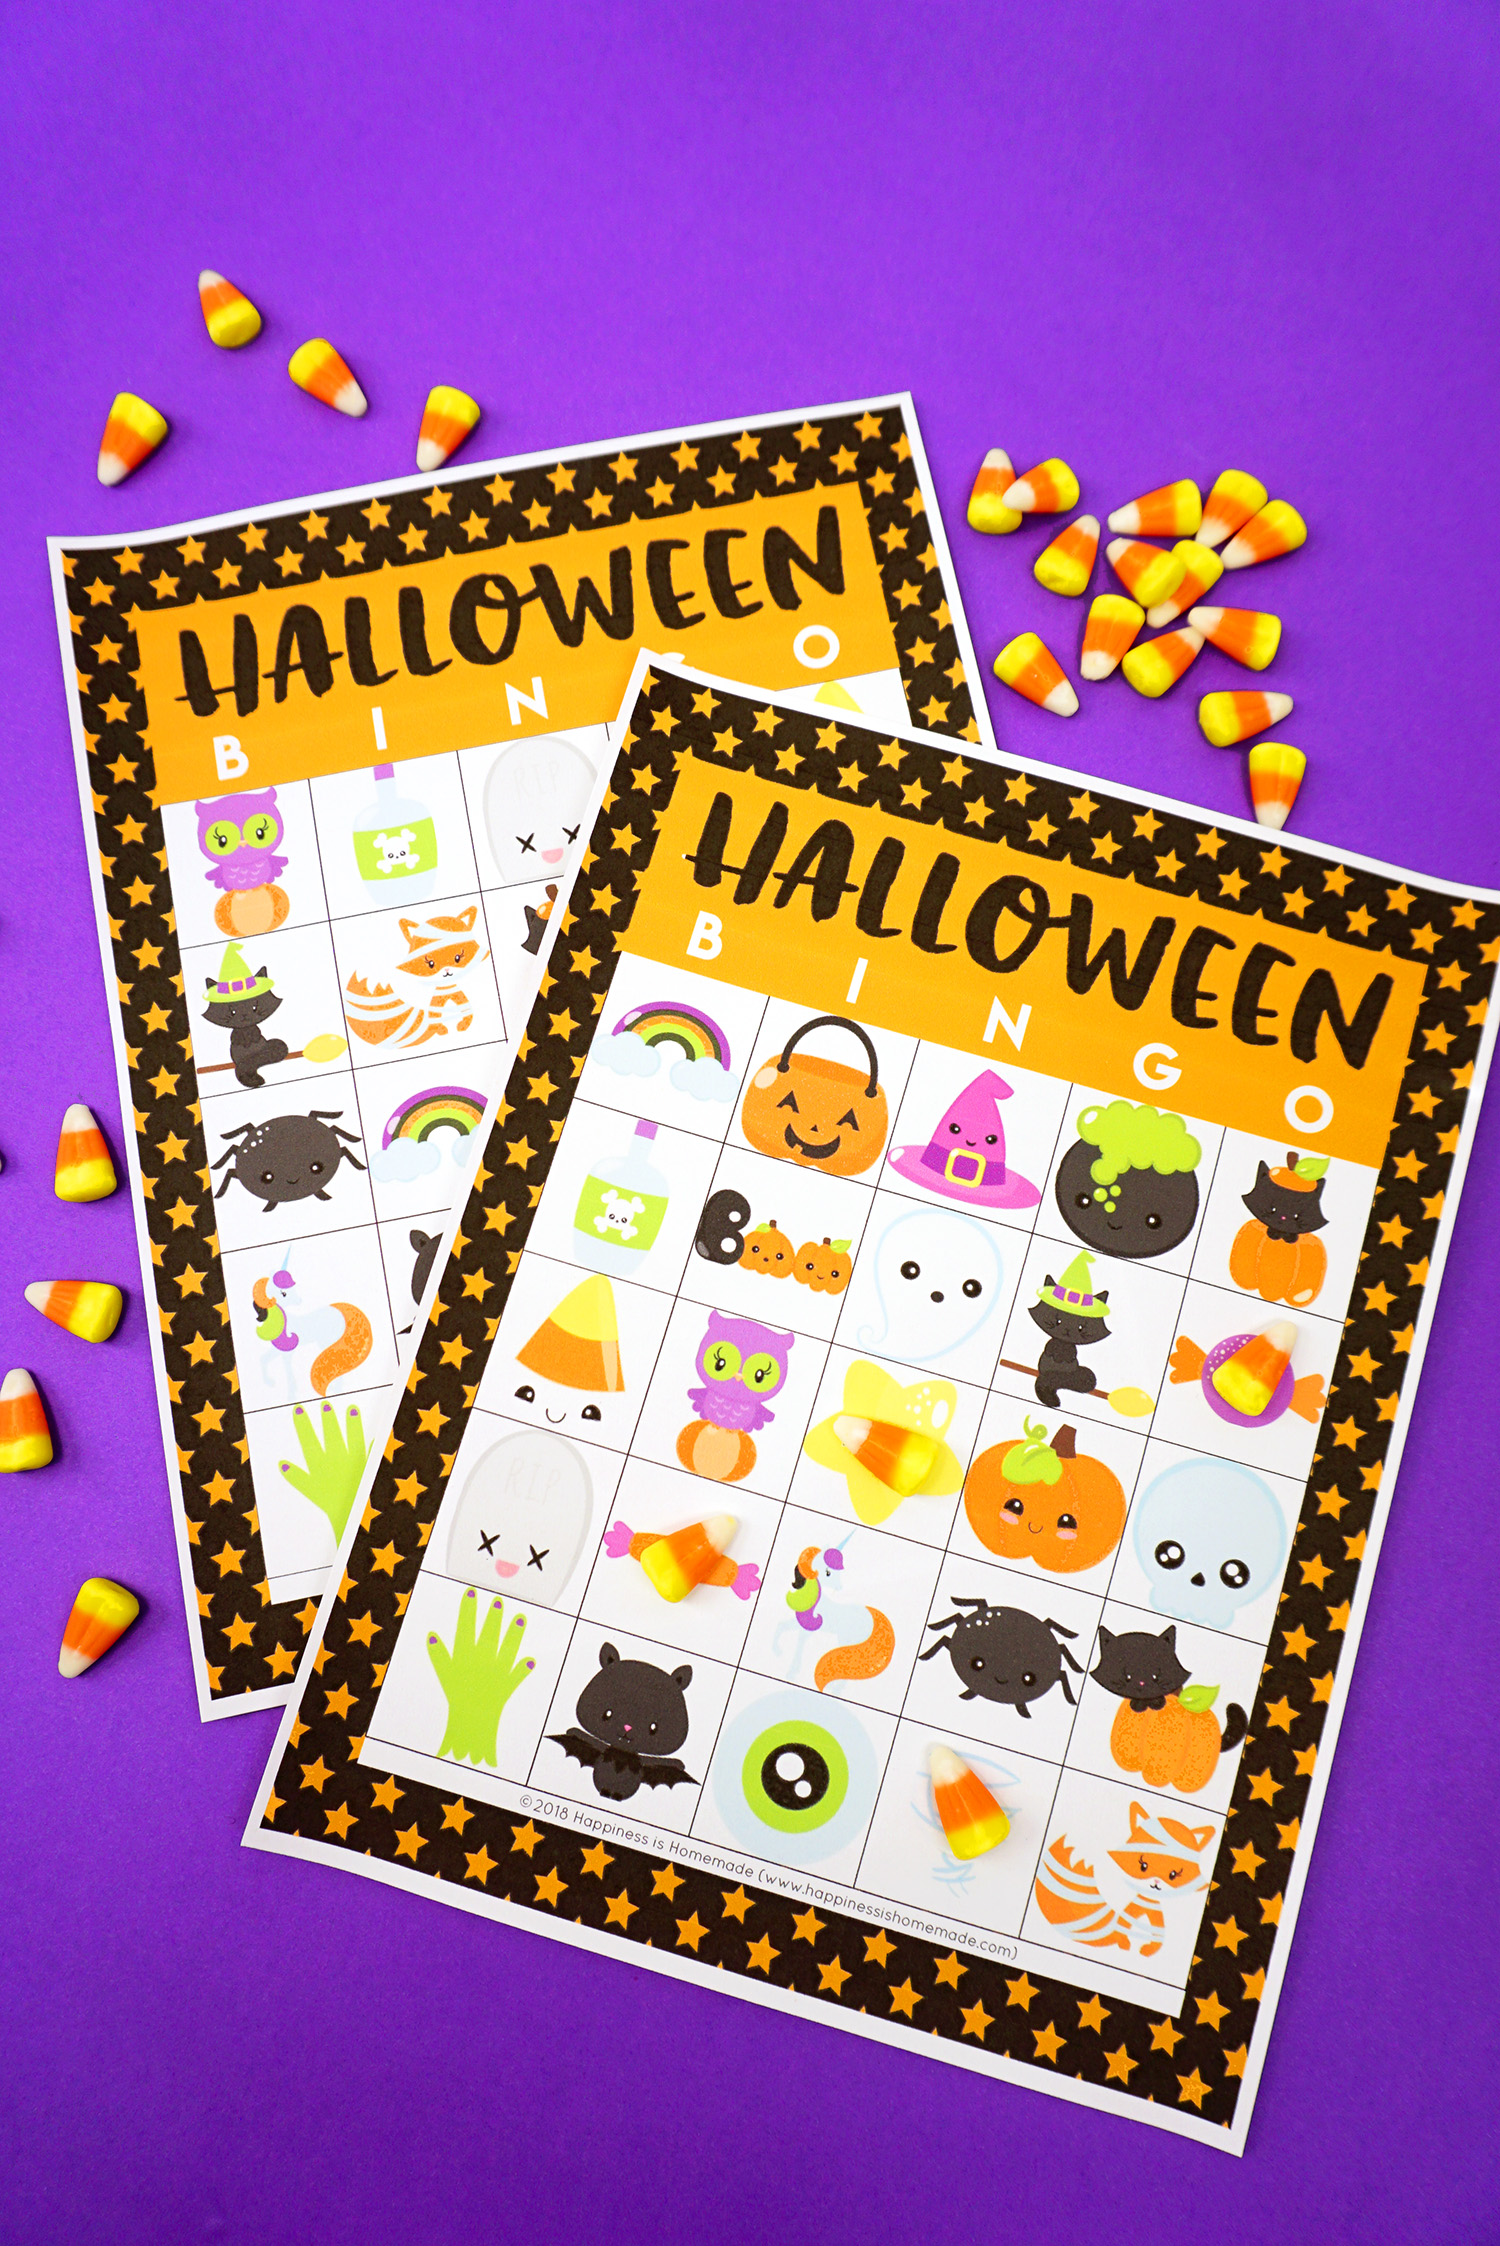 Printable Halloween Bingo Game Cards for Kids and Teachers